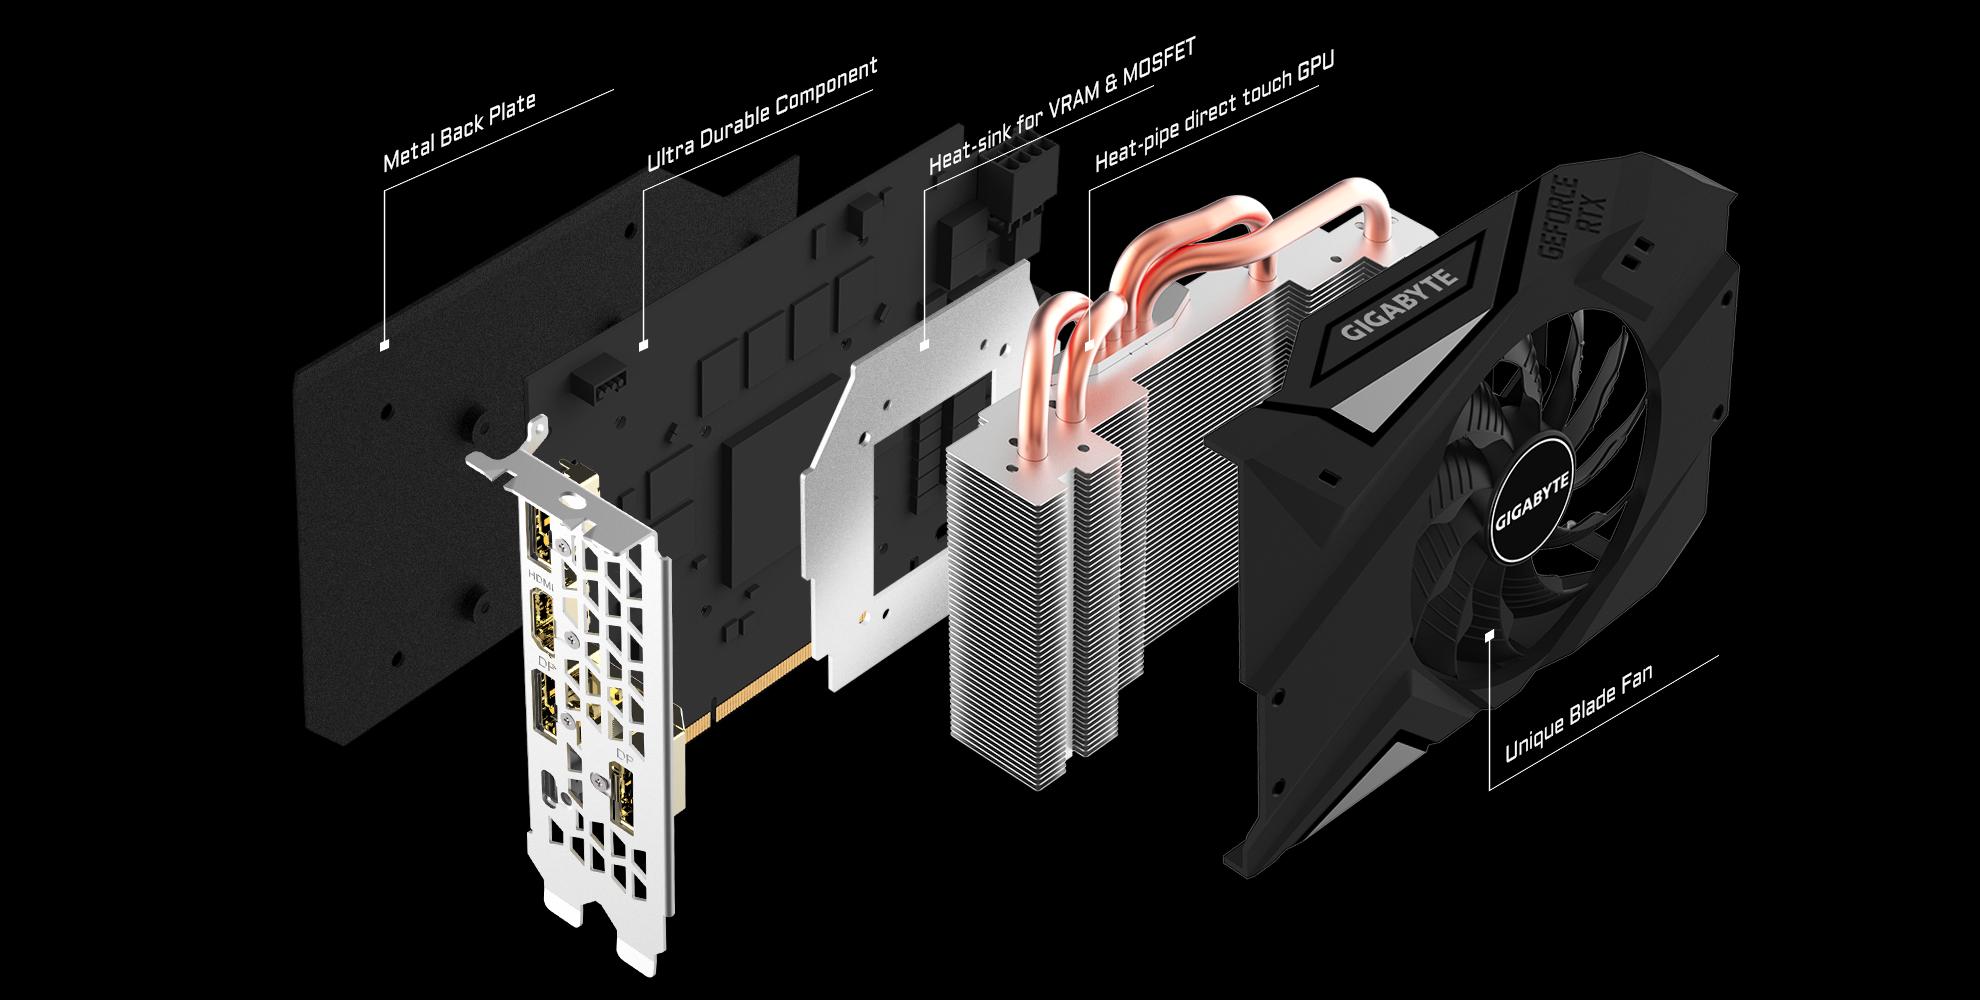 GeForce RTX™ 2070 MINI ITX 8G | Graphics Card - GIGABYTE Global